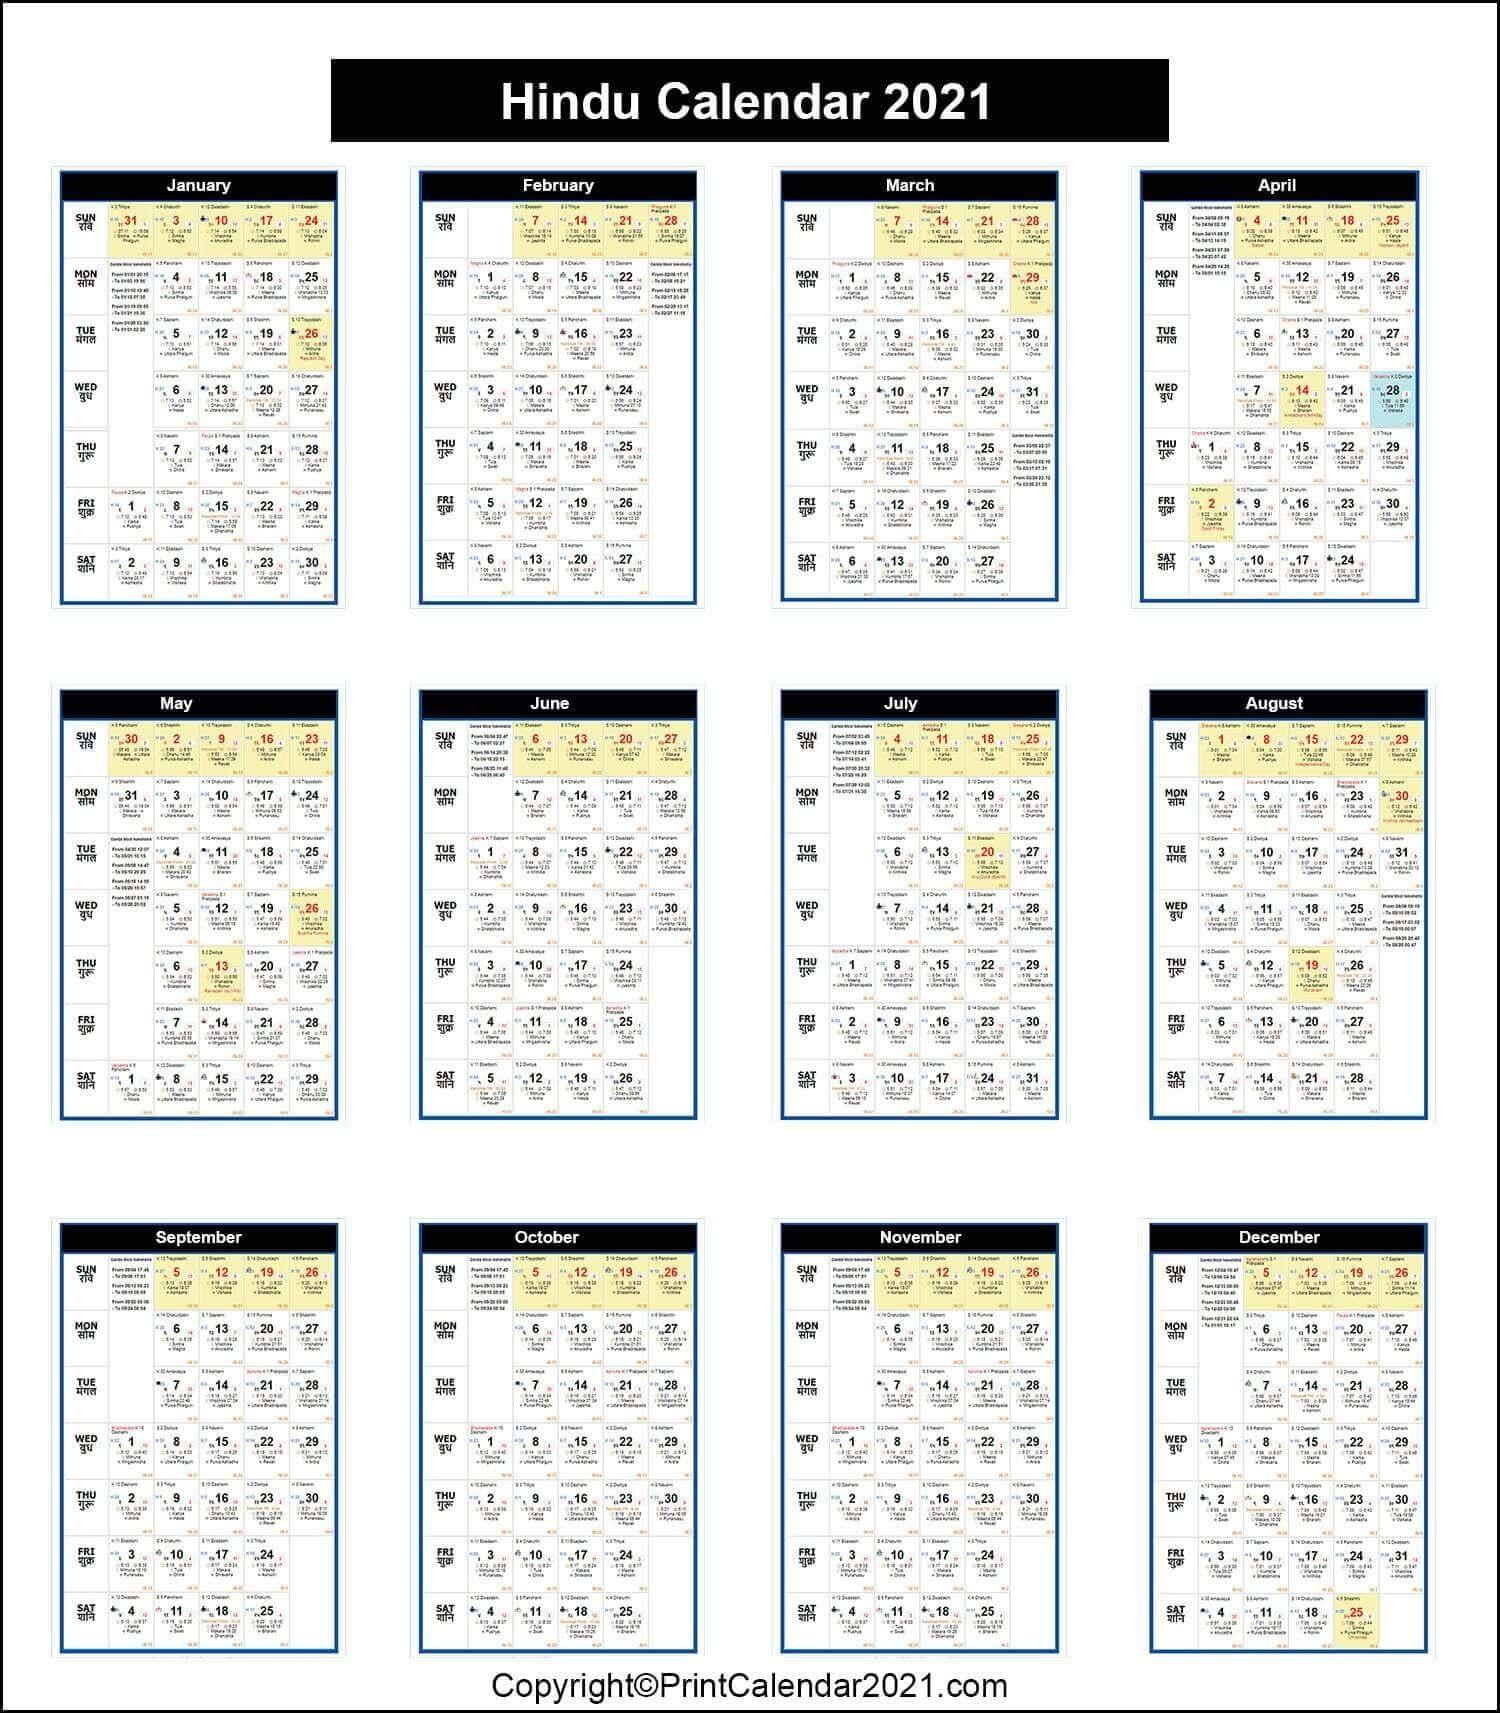 Catch Tithi Calendar September 2021 In Hindi